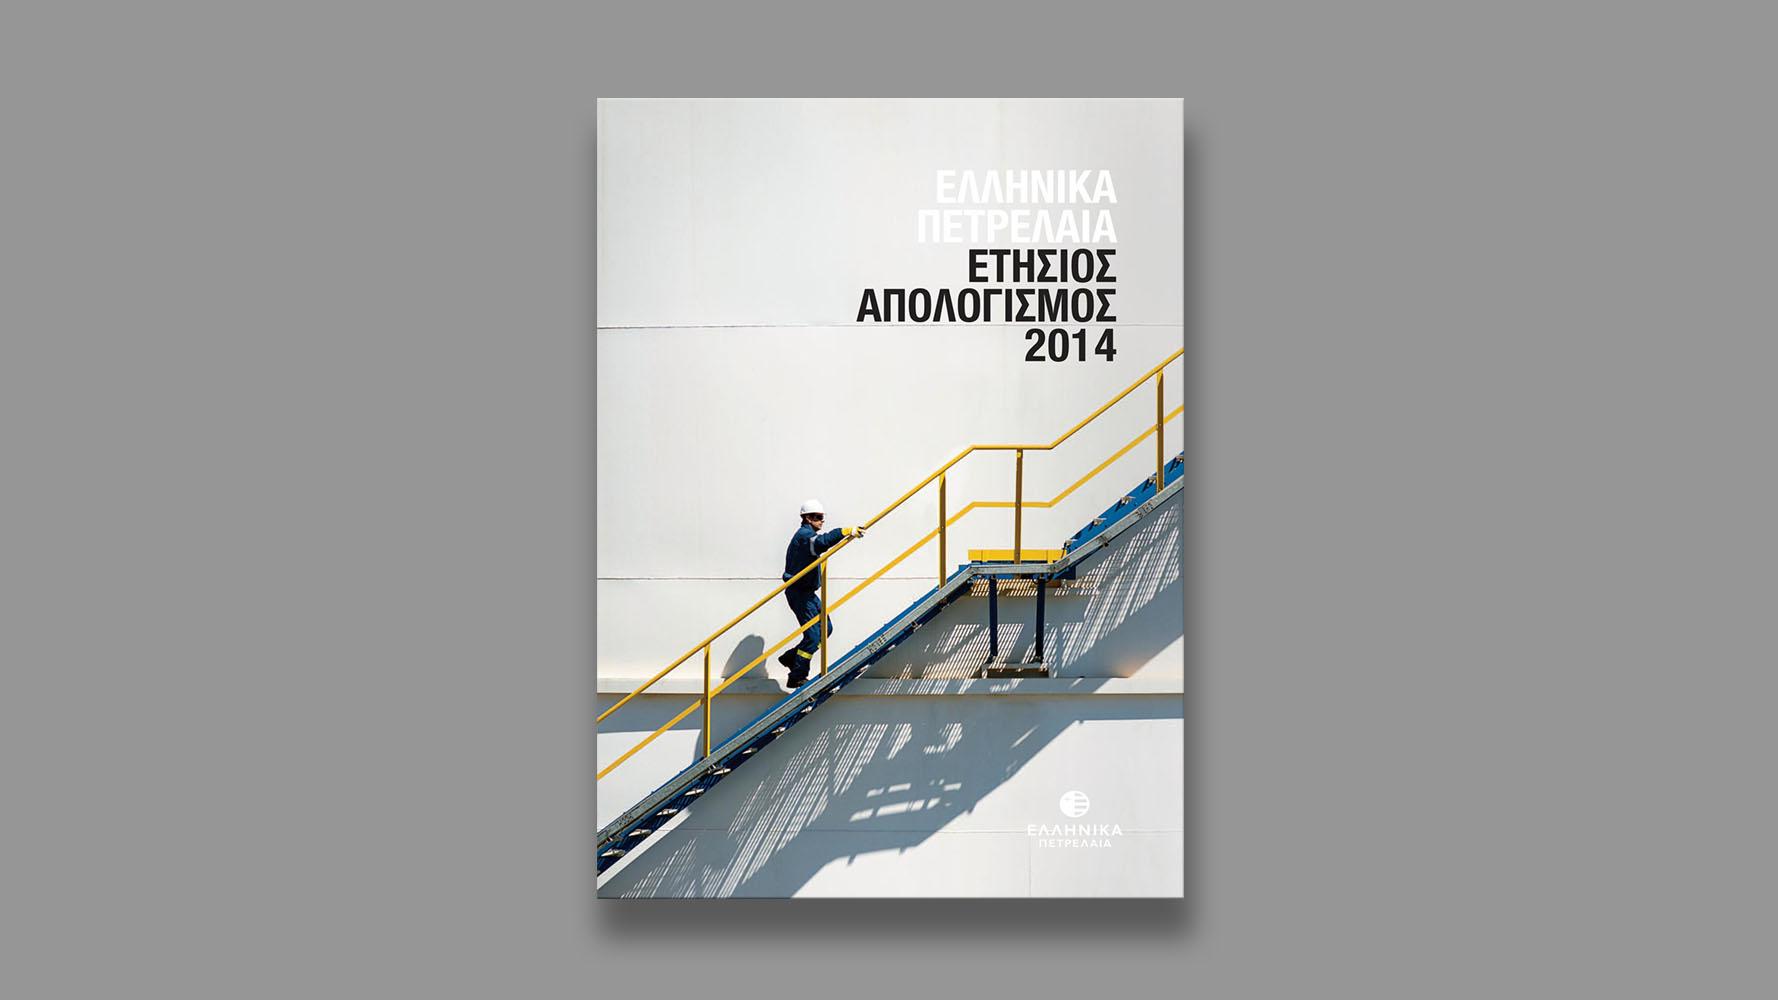 Hellenic Petroleum, Annual Report, 2014